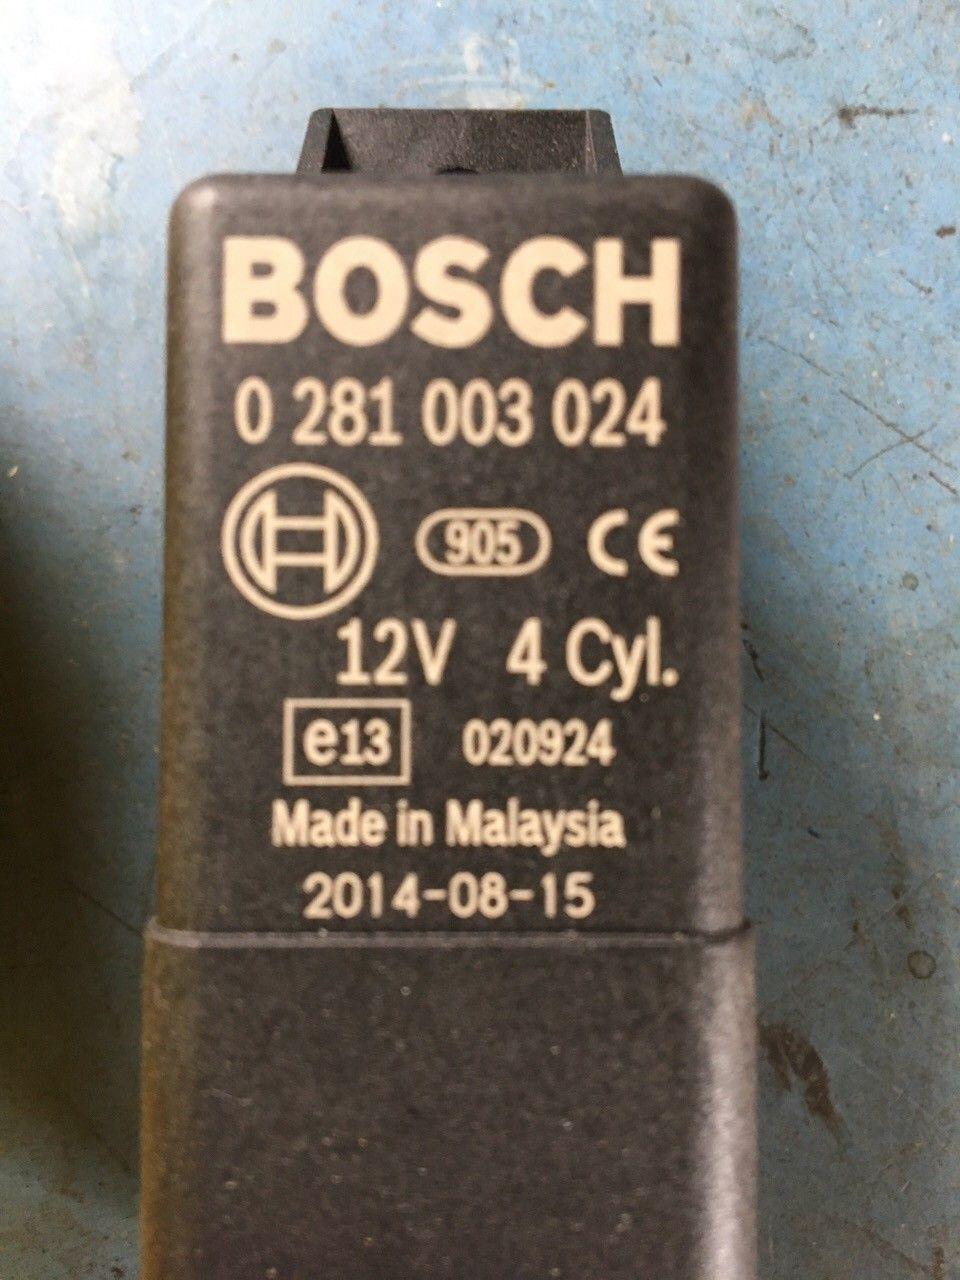 Bil - Vinje  - Nytt gløde relé  Bosch orginal nr :0 281 003 024 - Vinje